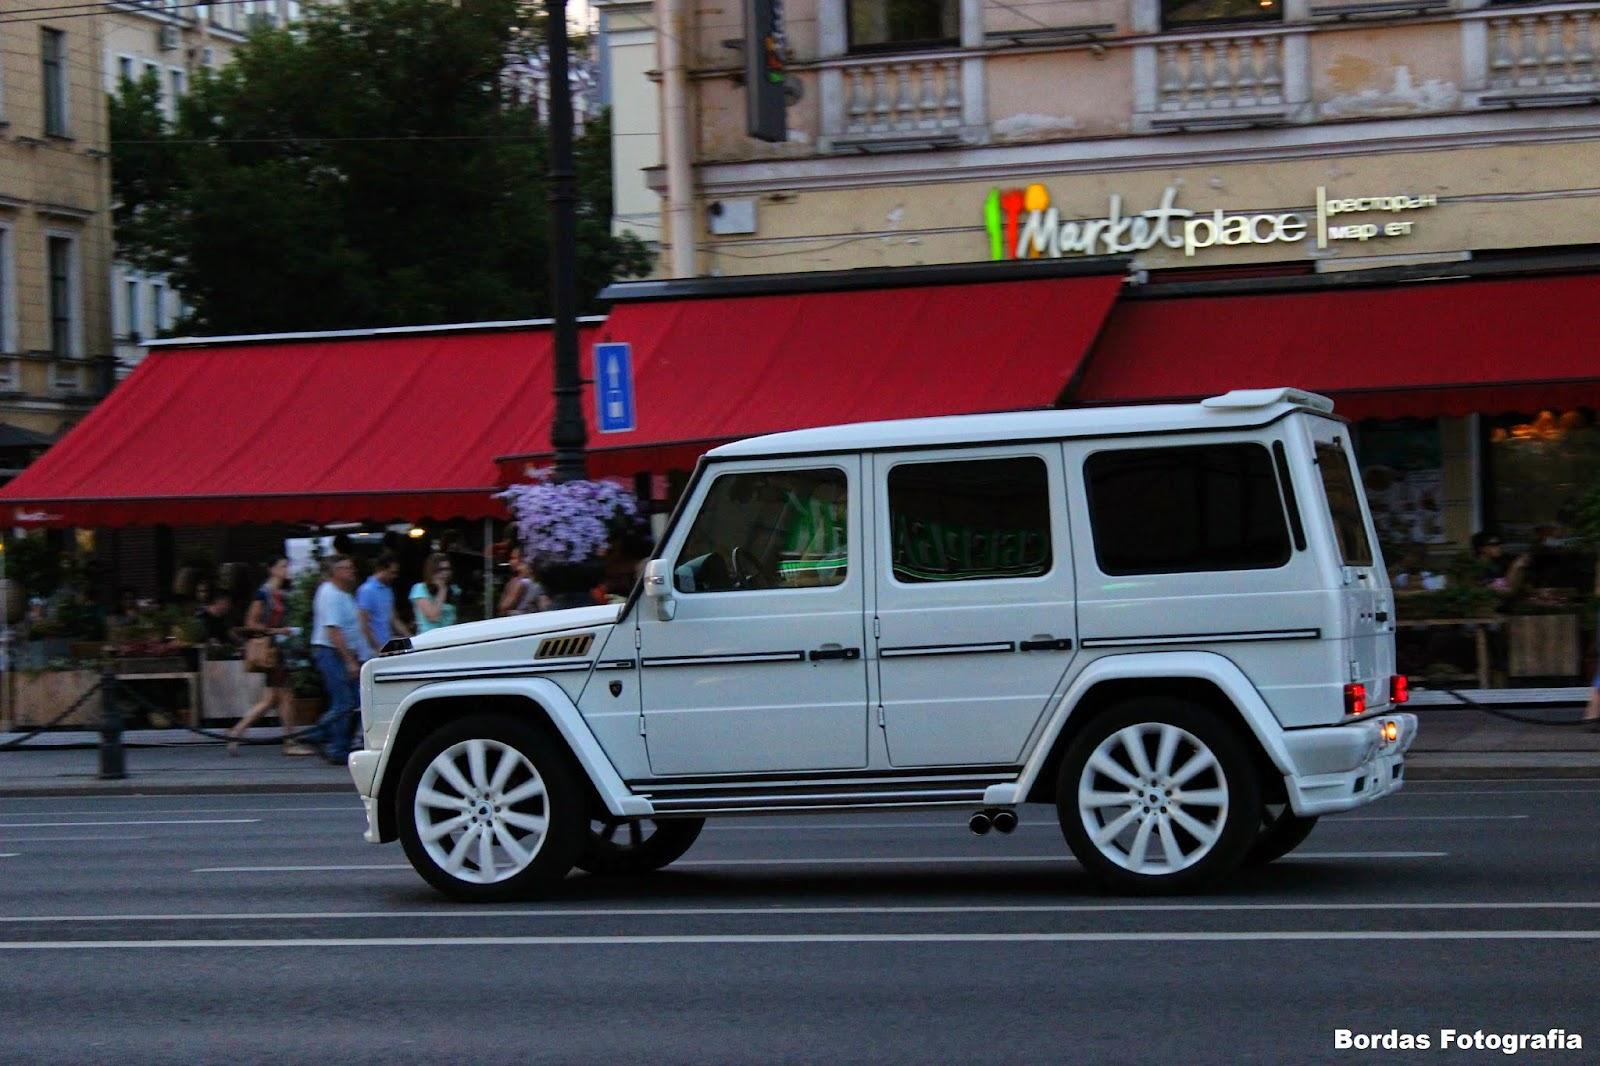 Bordas fotograf a mercedes benz hamann g hm600 st for Mercedes benz st petersburg